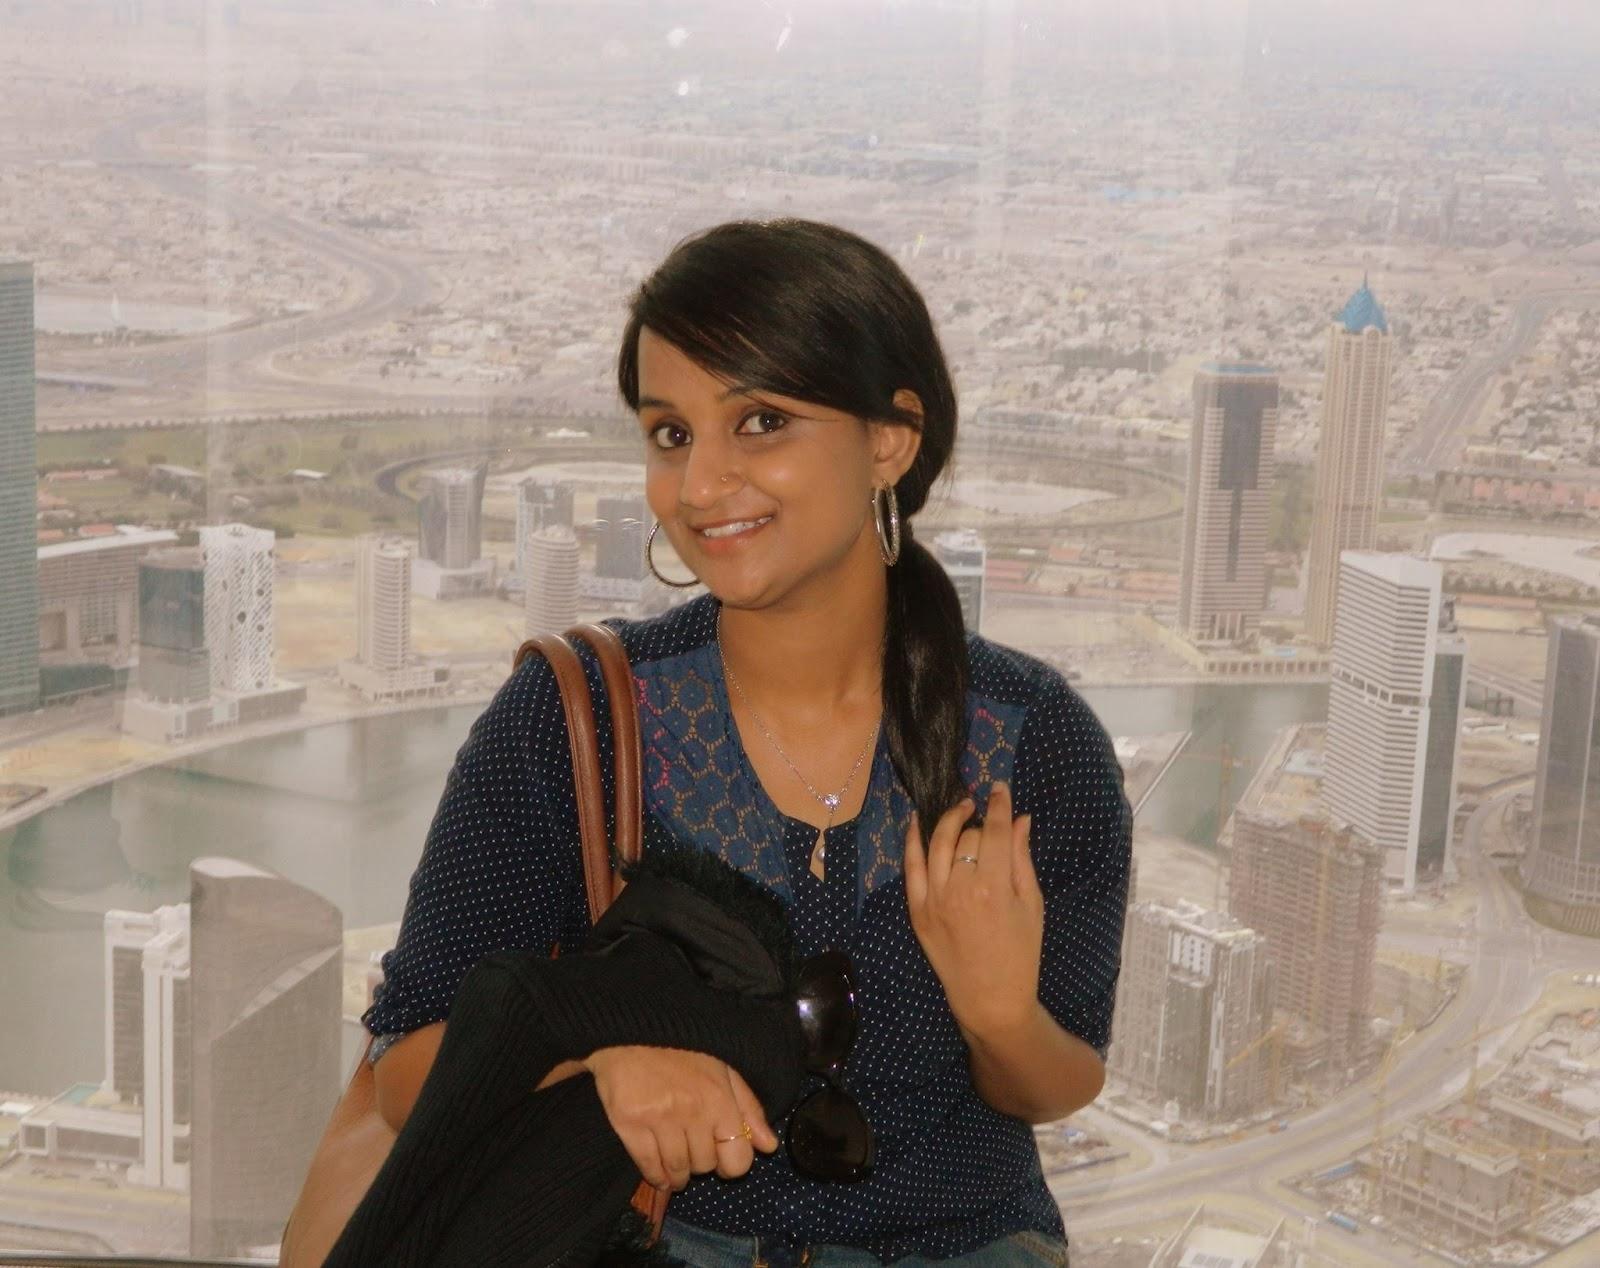 UAE girls Mobile number Friendship: Numbers of Housewives